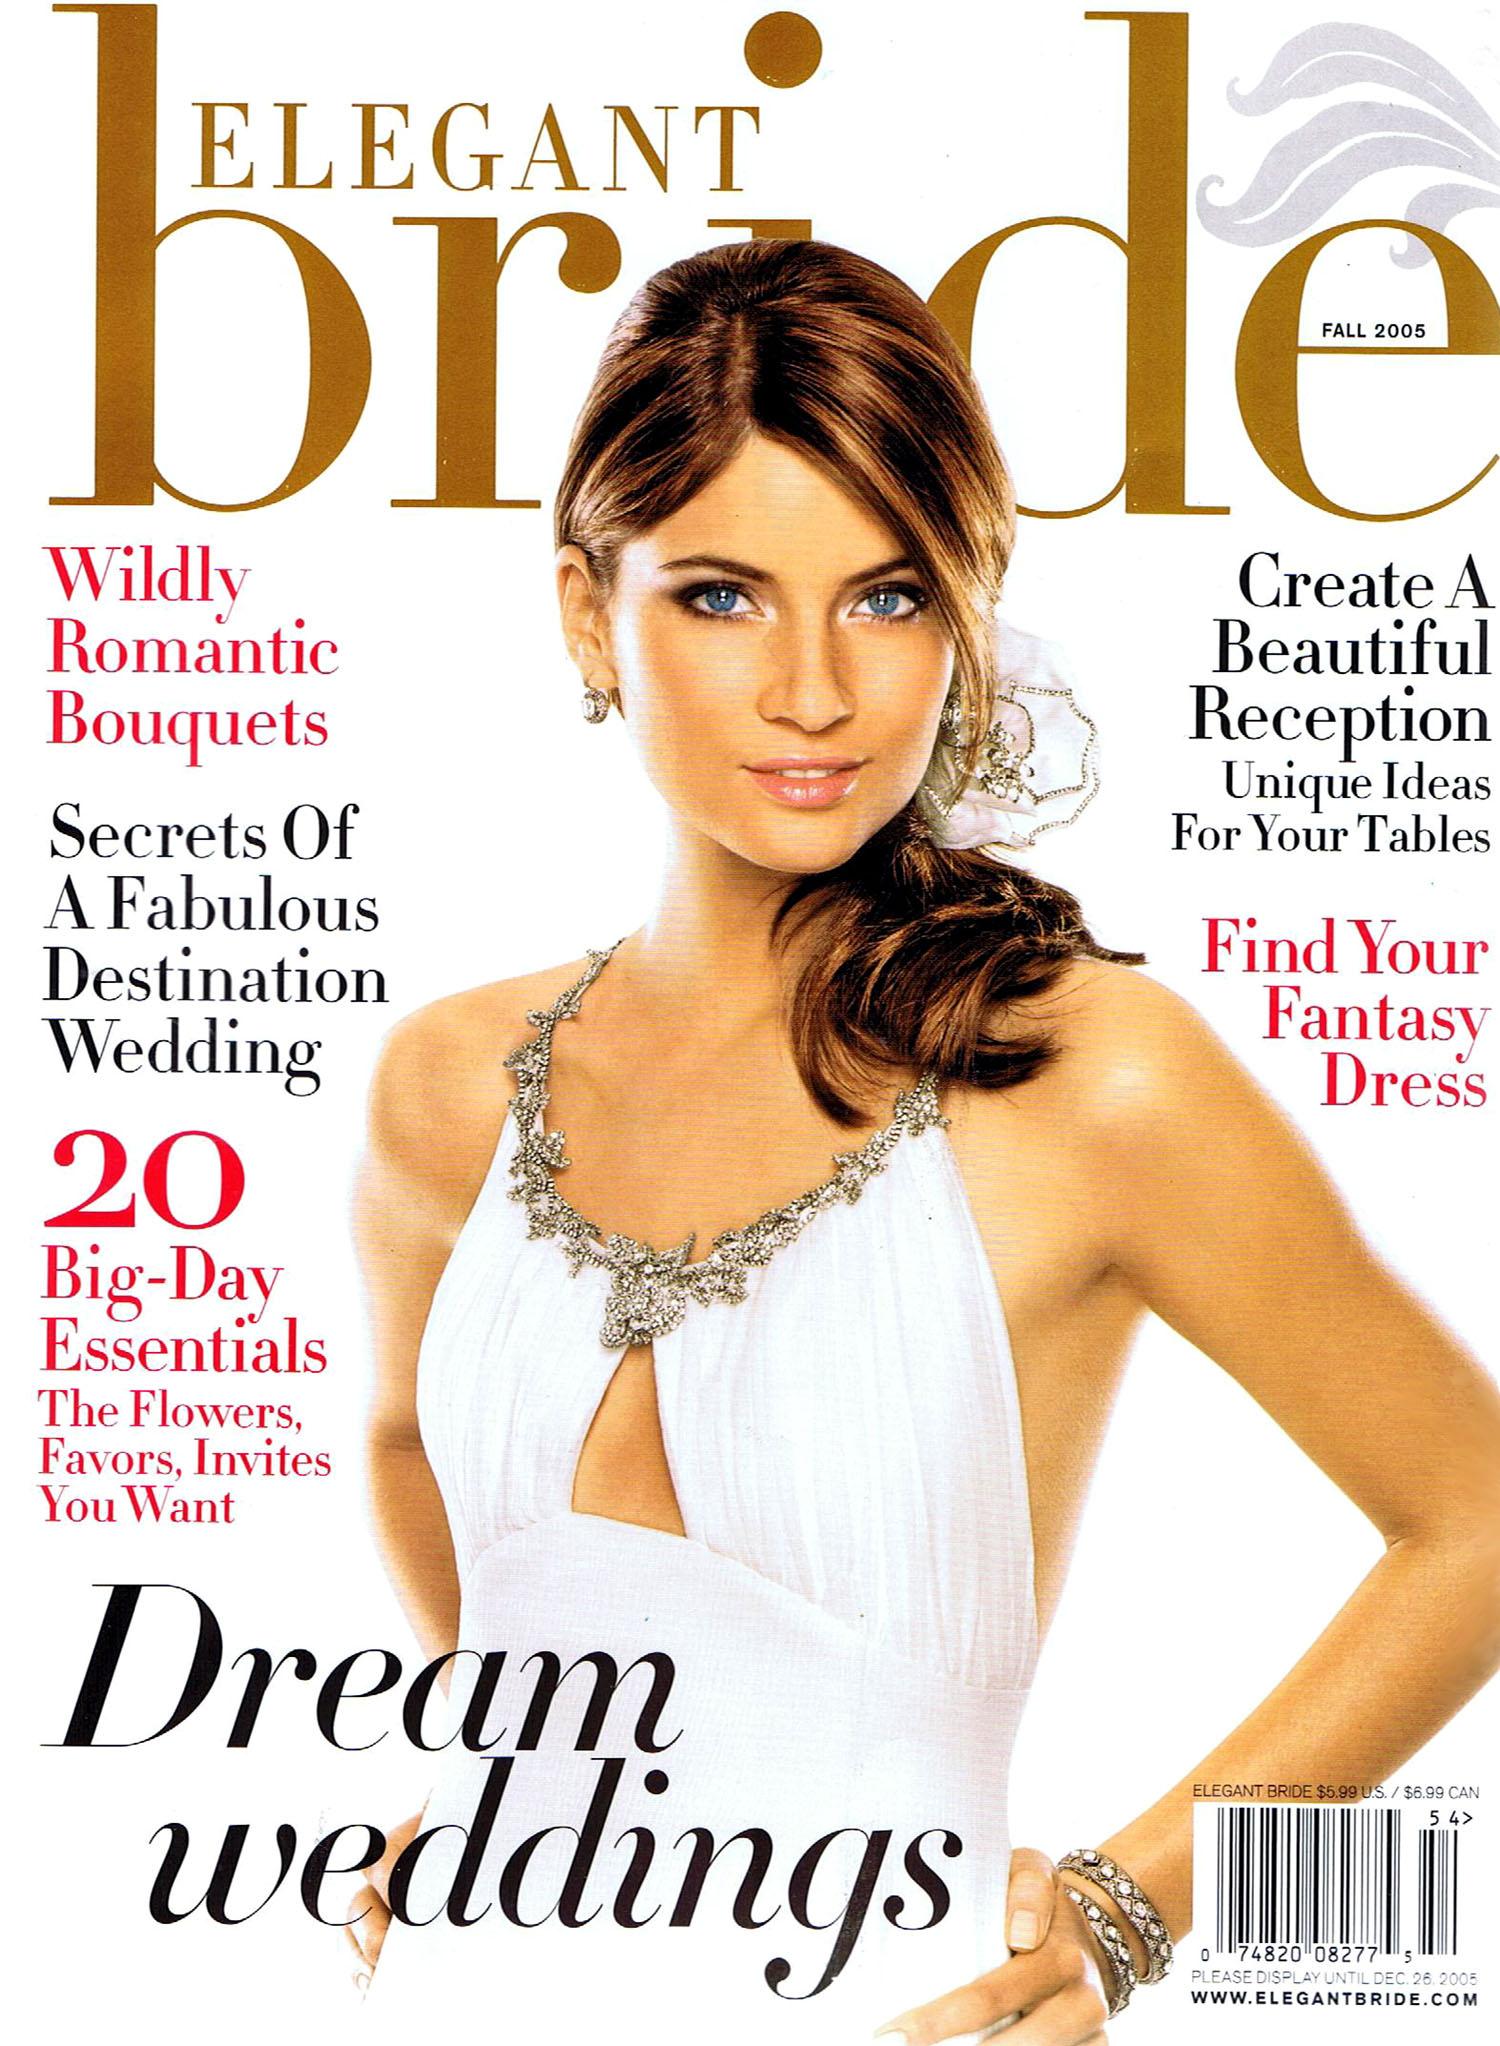 Elegant Bride Fall 2005 1 - edit 3.jpg